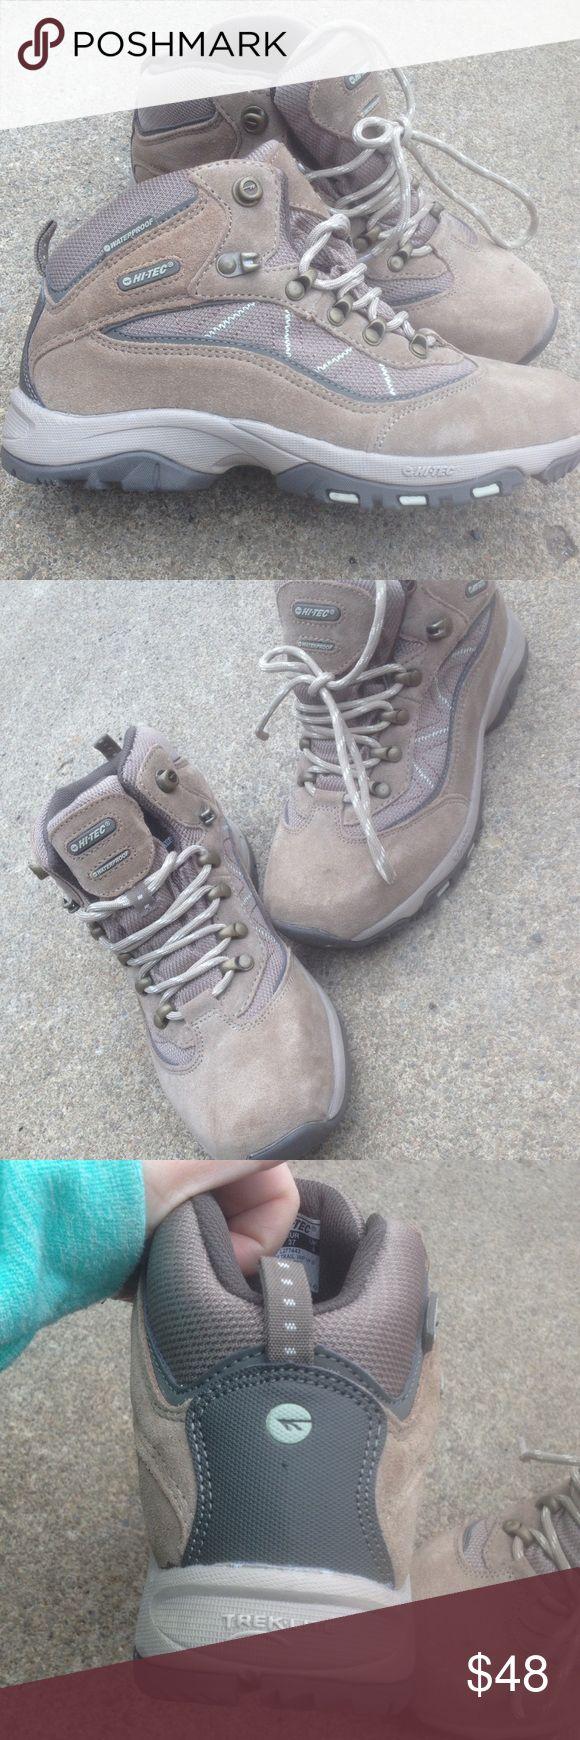 Women's Hi-Tec Hiking Trail Boots 6M Waterproof Women's Hi-Tec Hiking Trail Boots 6M New Style:Cliff Trail Waterproof Beige Leather  New! No box Hi-Tec Shoes Winter & Rain Boots